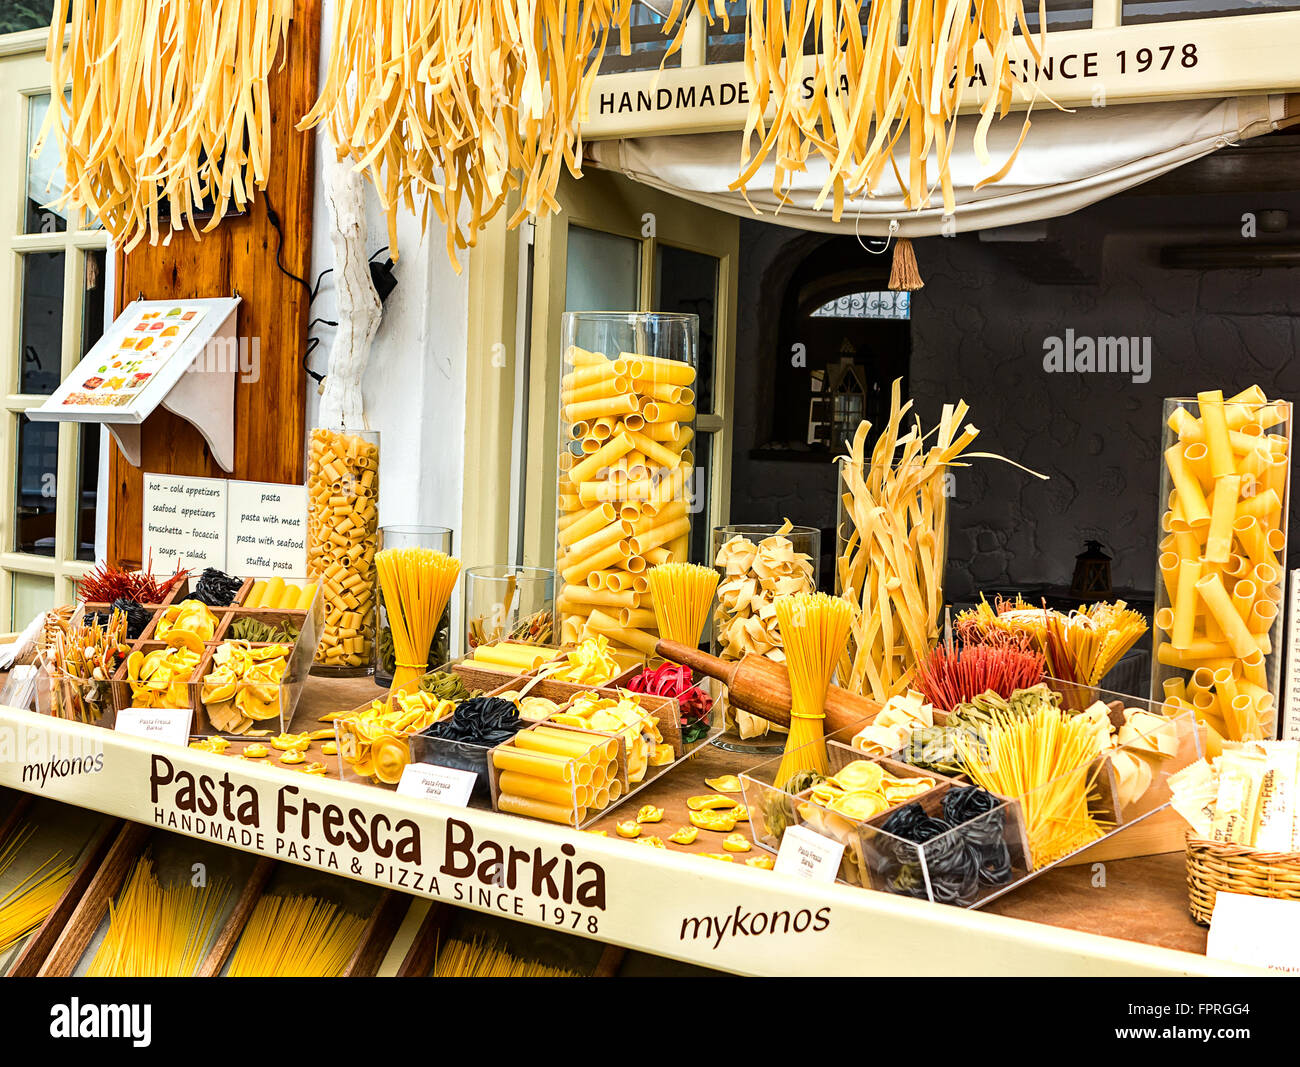 Homemade Pasta Shop in Mykonos, Greece - Stock Image